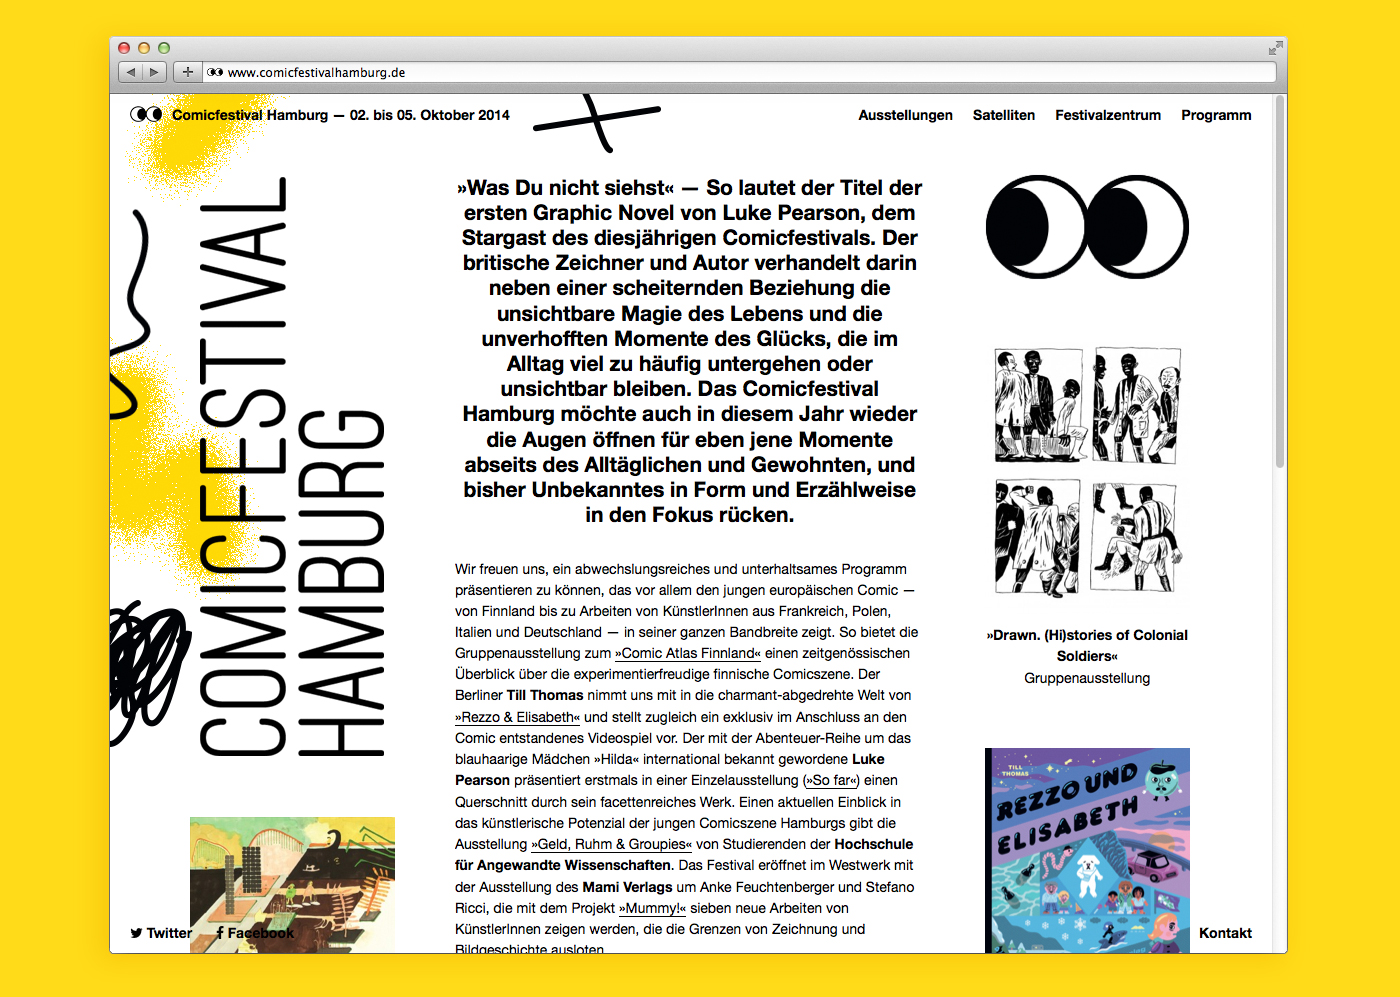 Comicfestival Hamburg 2014